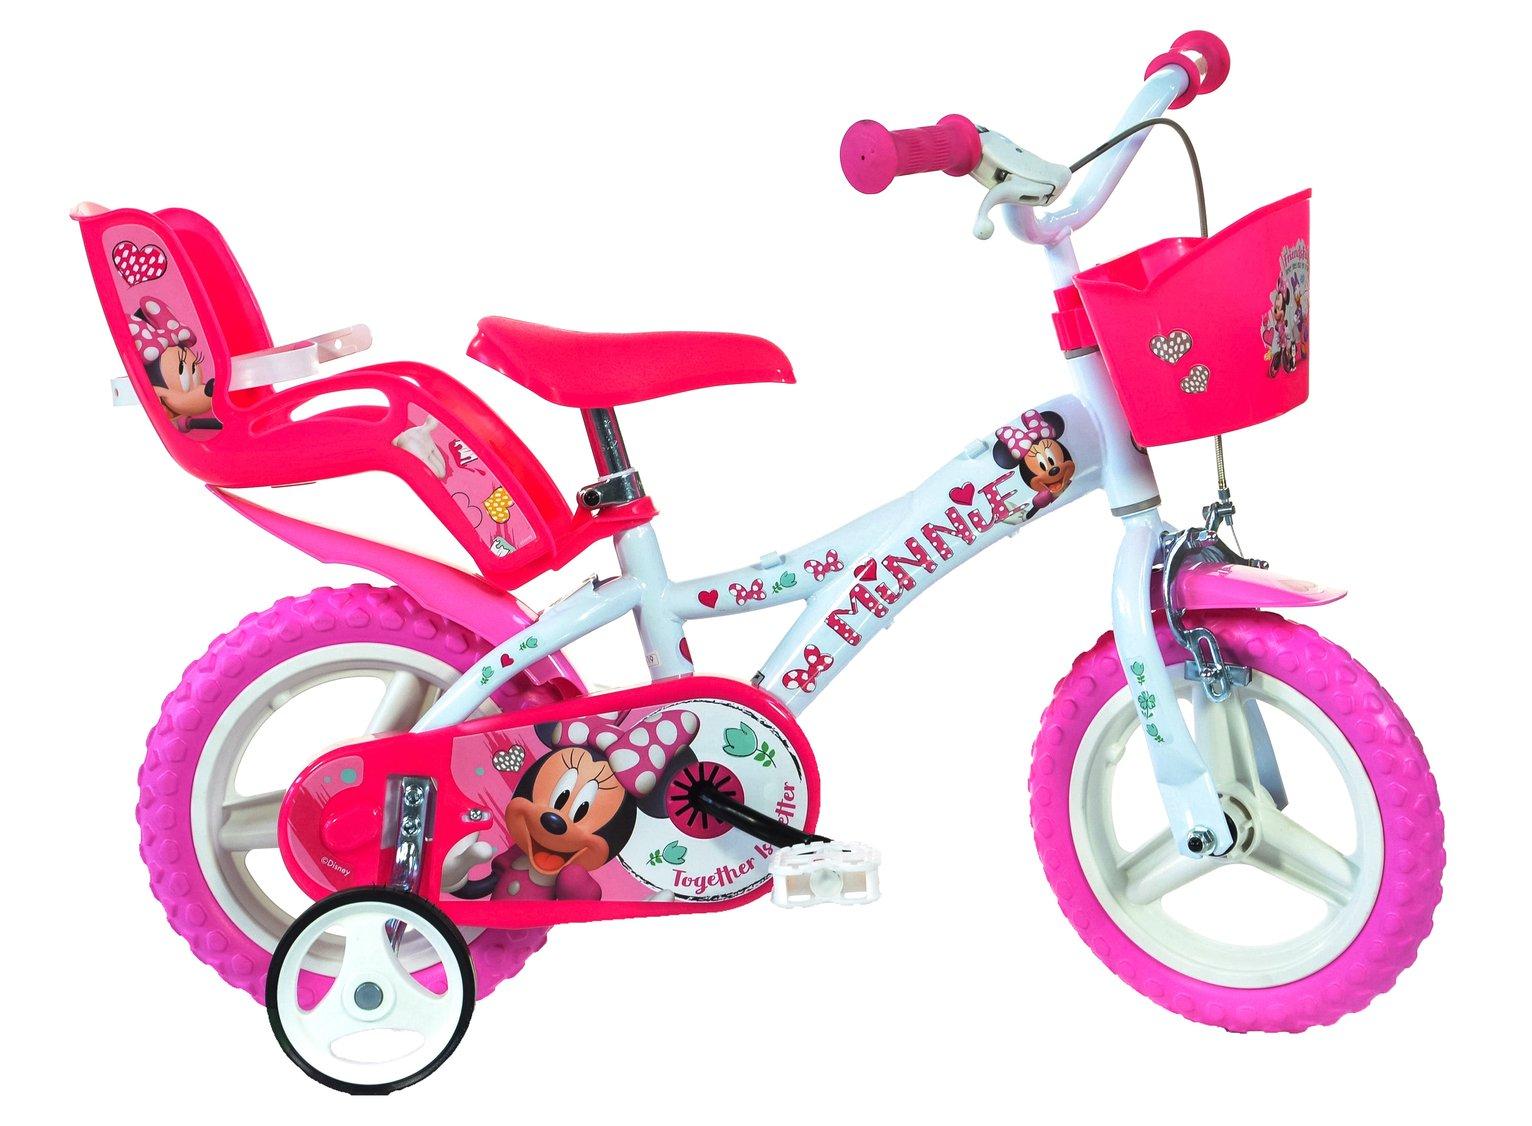 Image of Dino Bikes Minnie Mouse 12 Inch Kids Bike